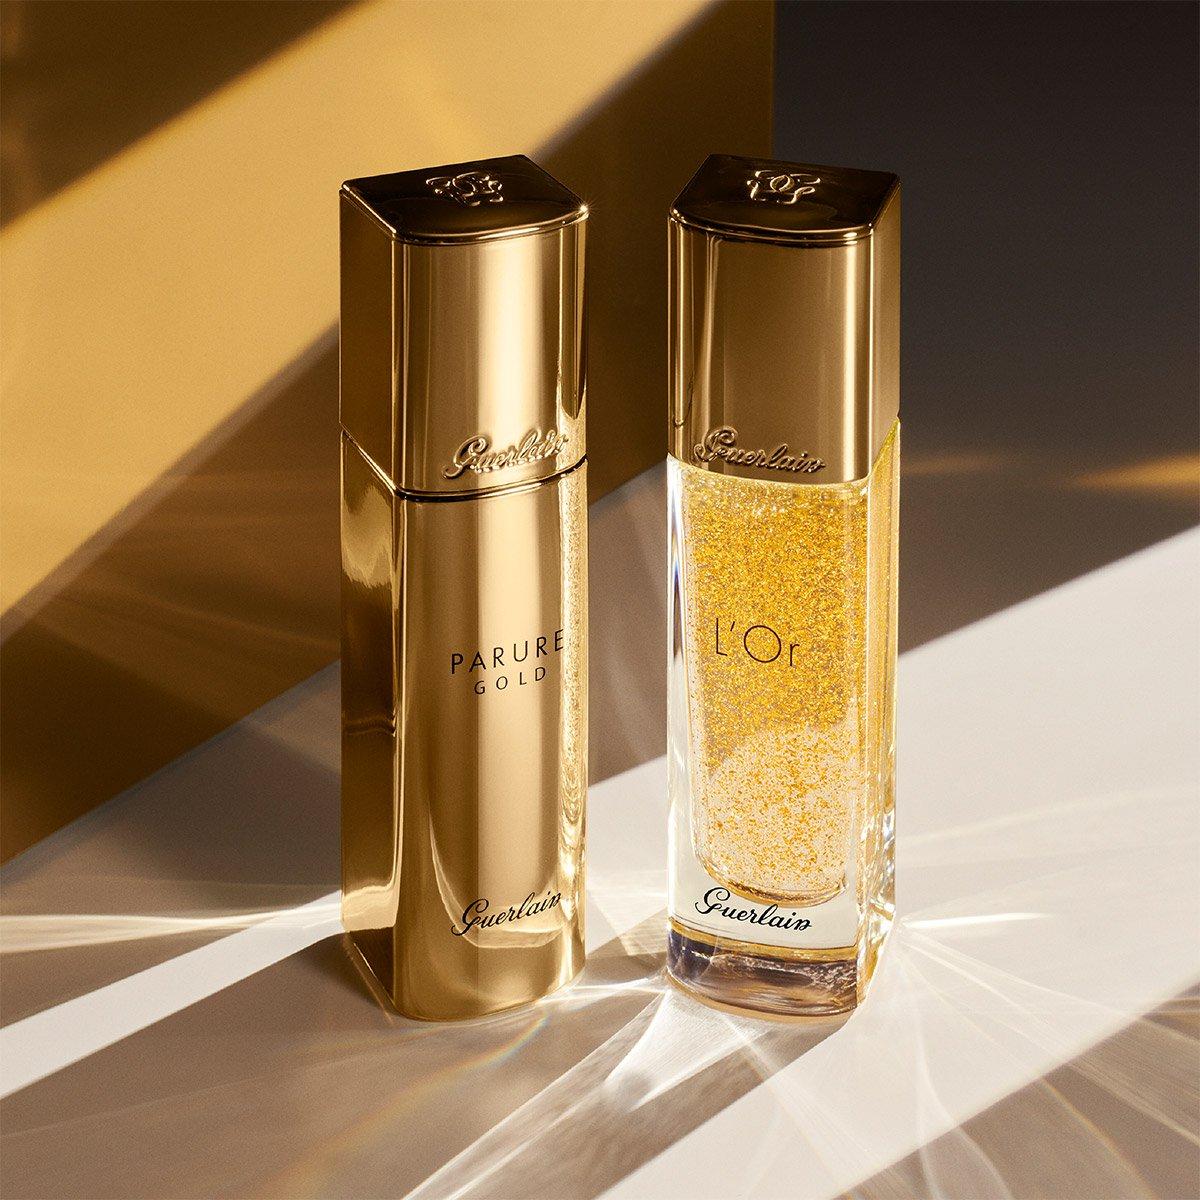 Base de Maquillaje Fluida Guerlain Parure Gold 03 Beige Naturel 30 Ml